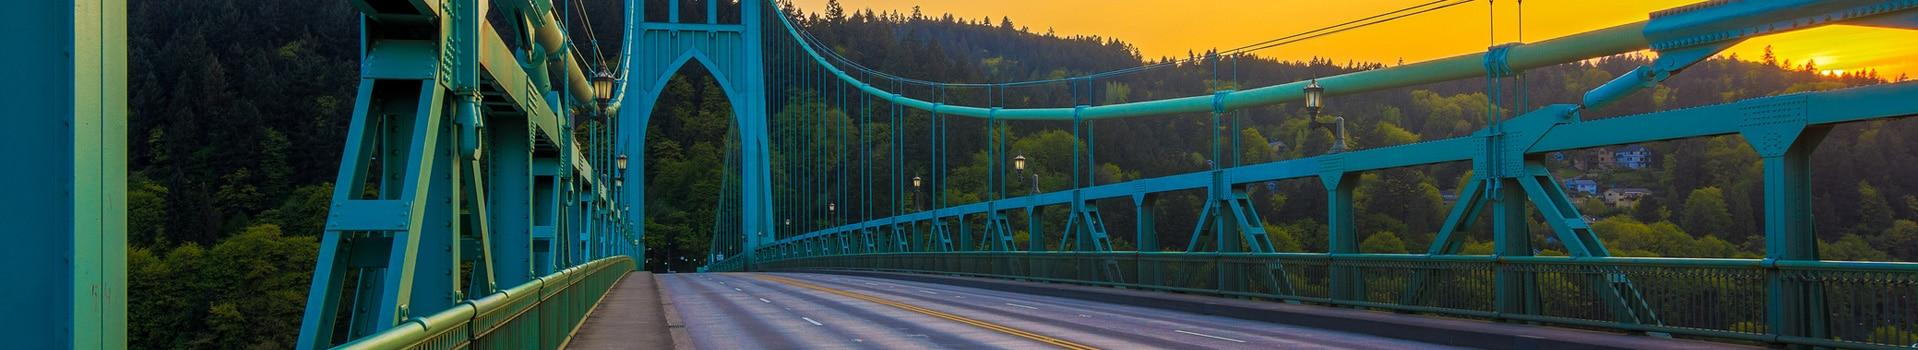 bridge fall protection